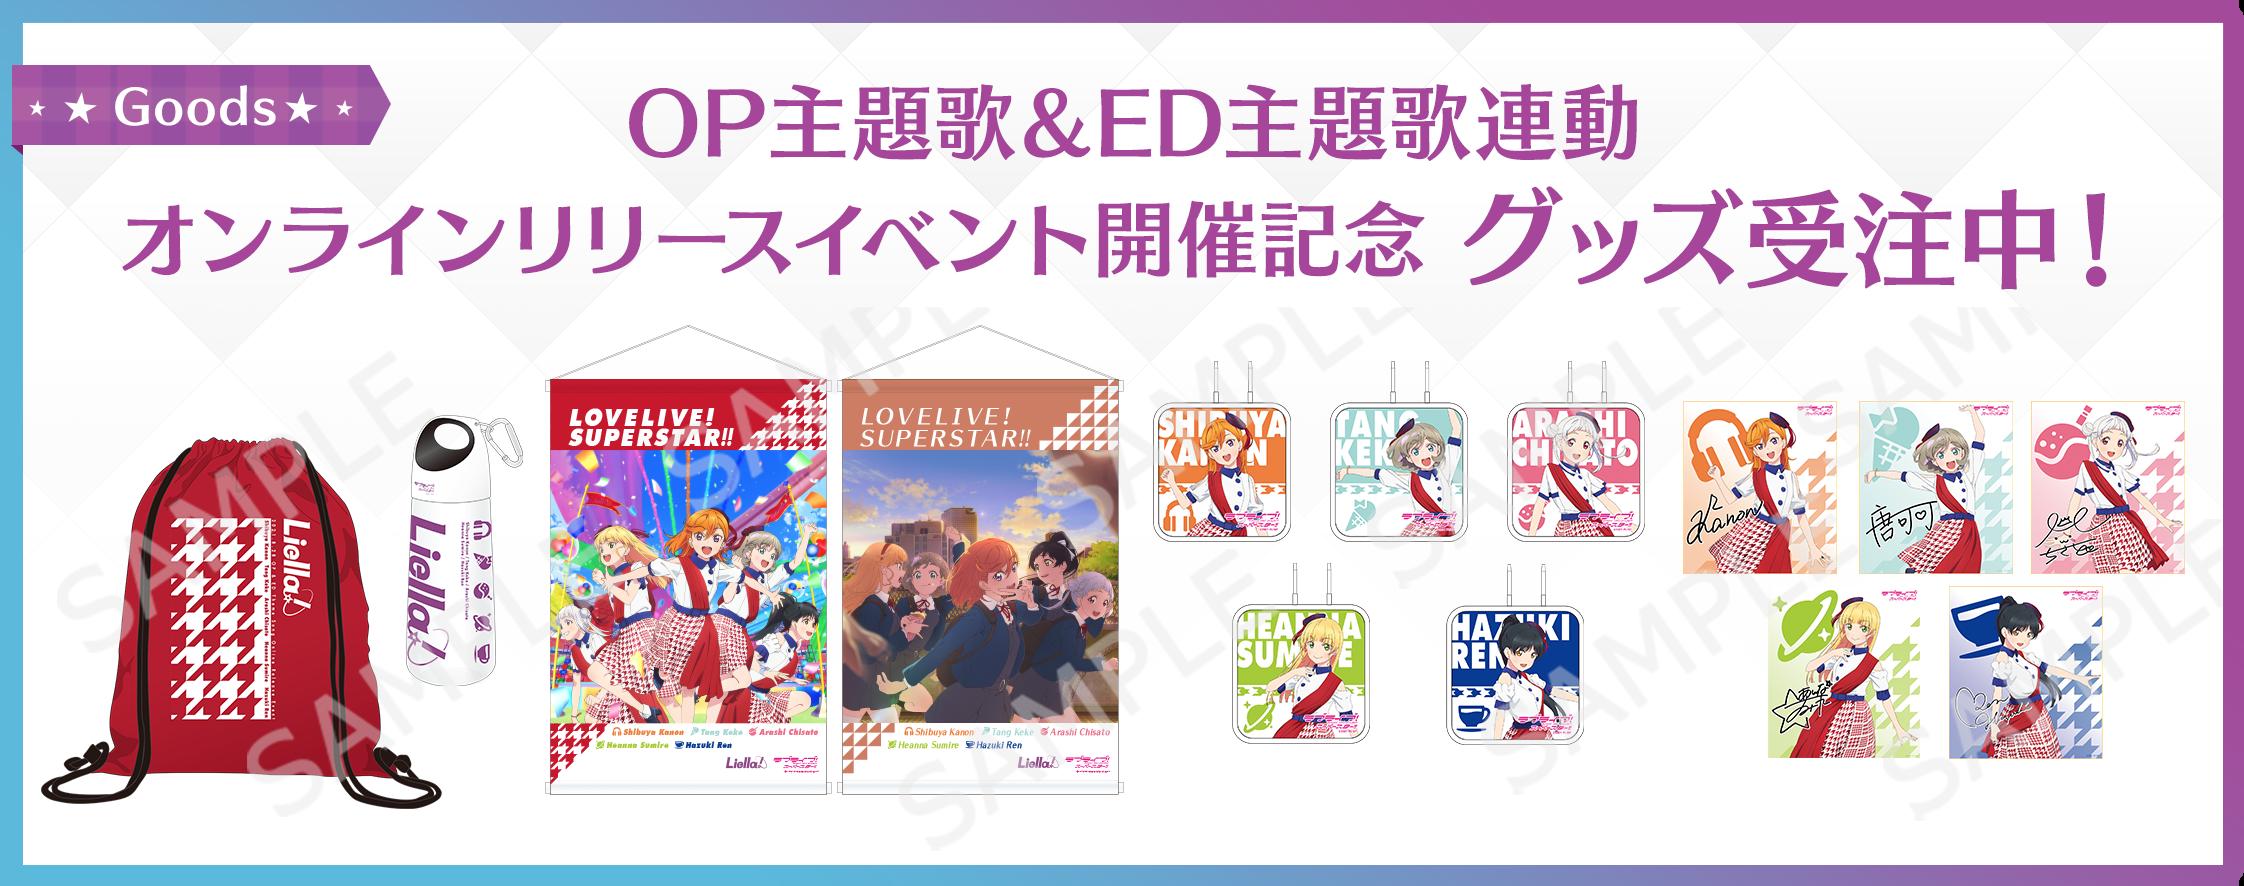 OP主題歌&ED主題歌連動オンラインリリースイベント開催記念 グッズ受注中!